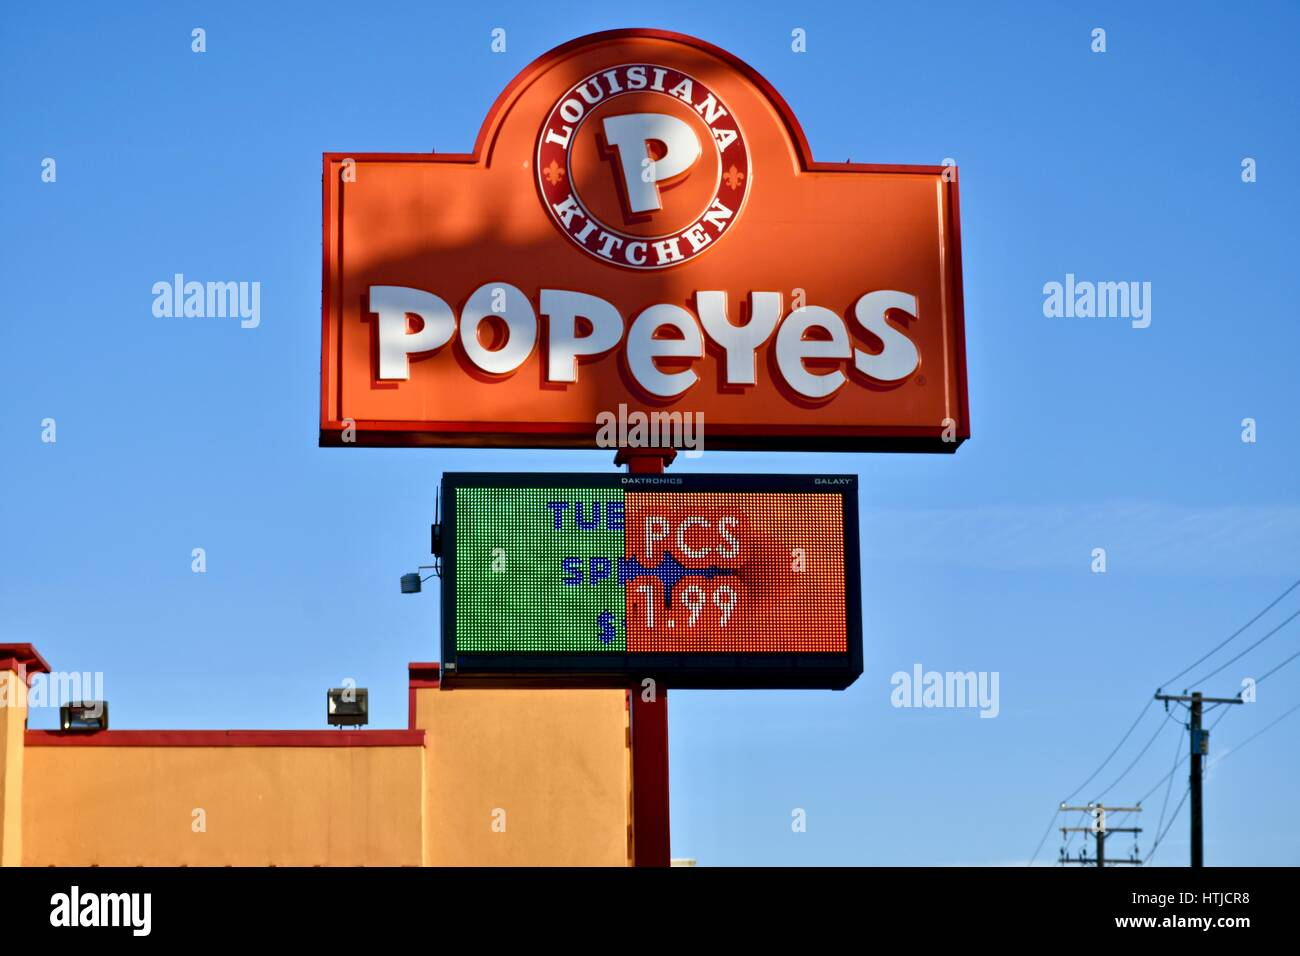 Popeyes Stock Photos  Popeyes Stock Images  Alamy